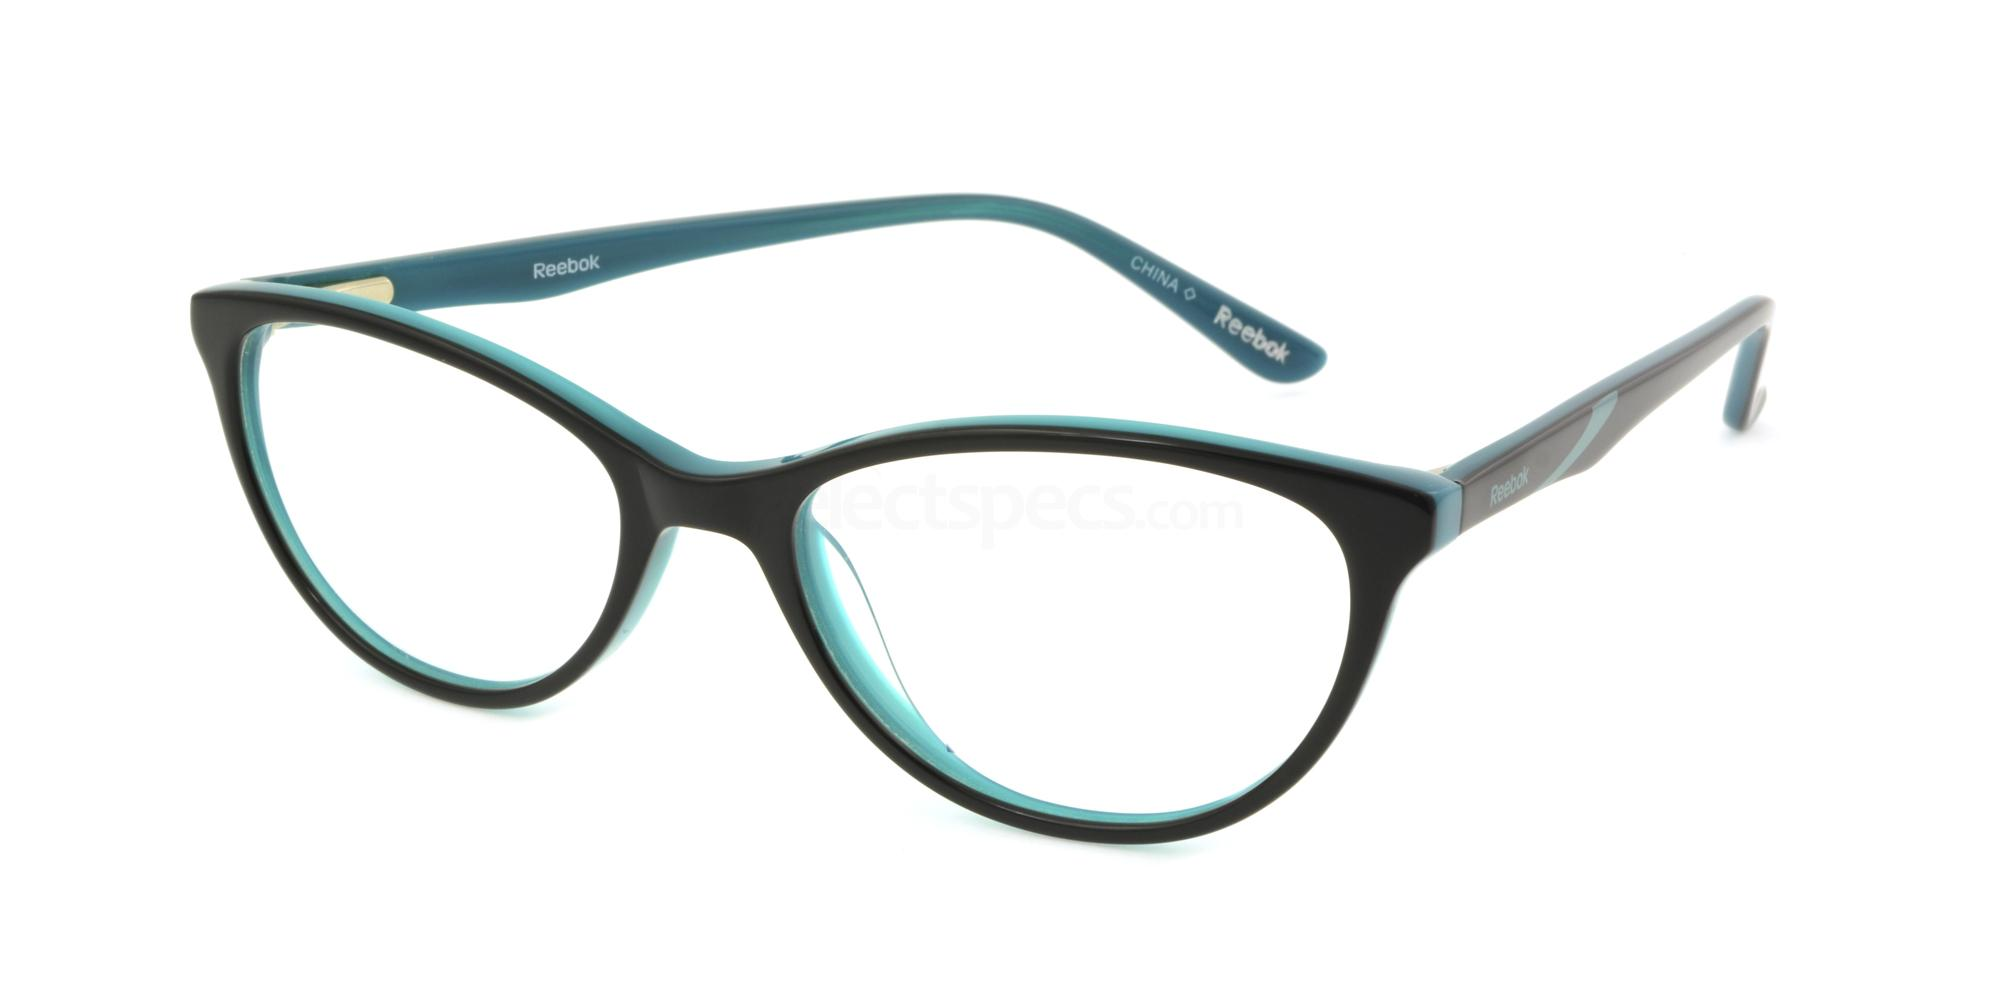 BLK RB8010 Glasses, Reebok